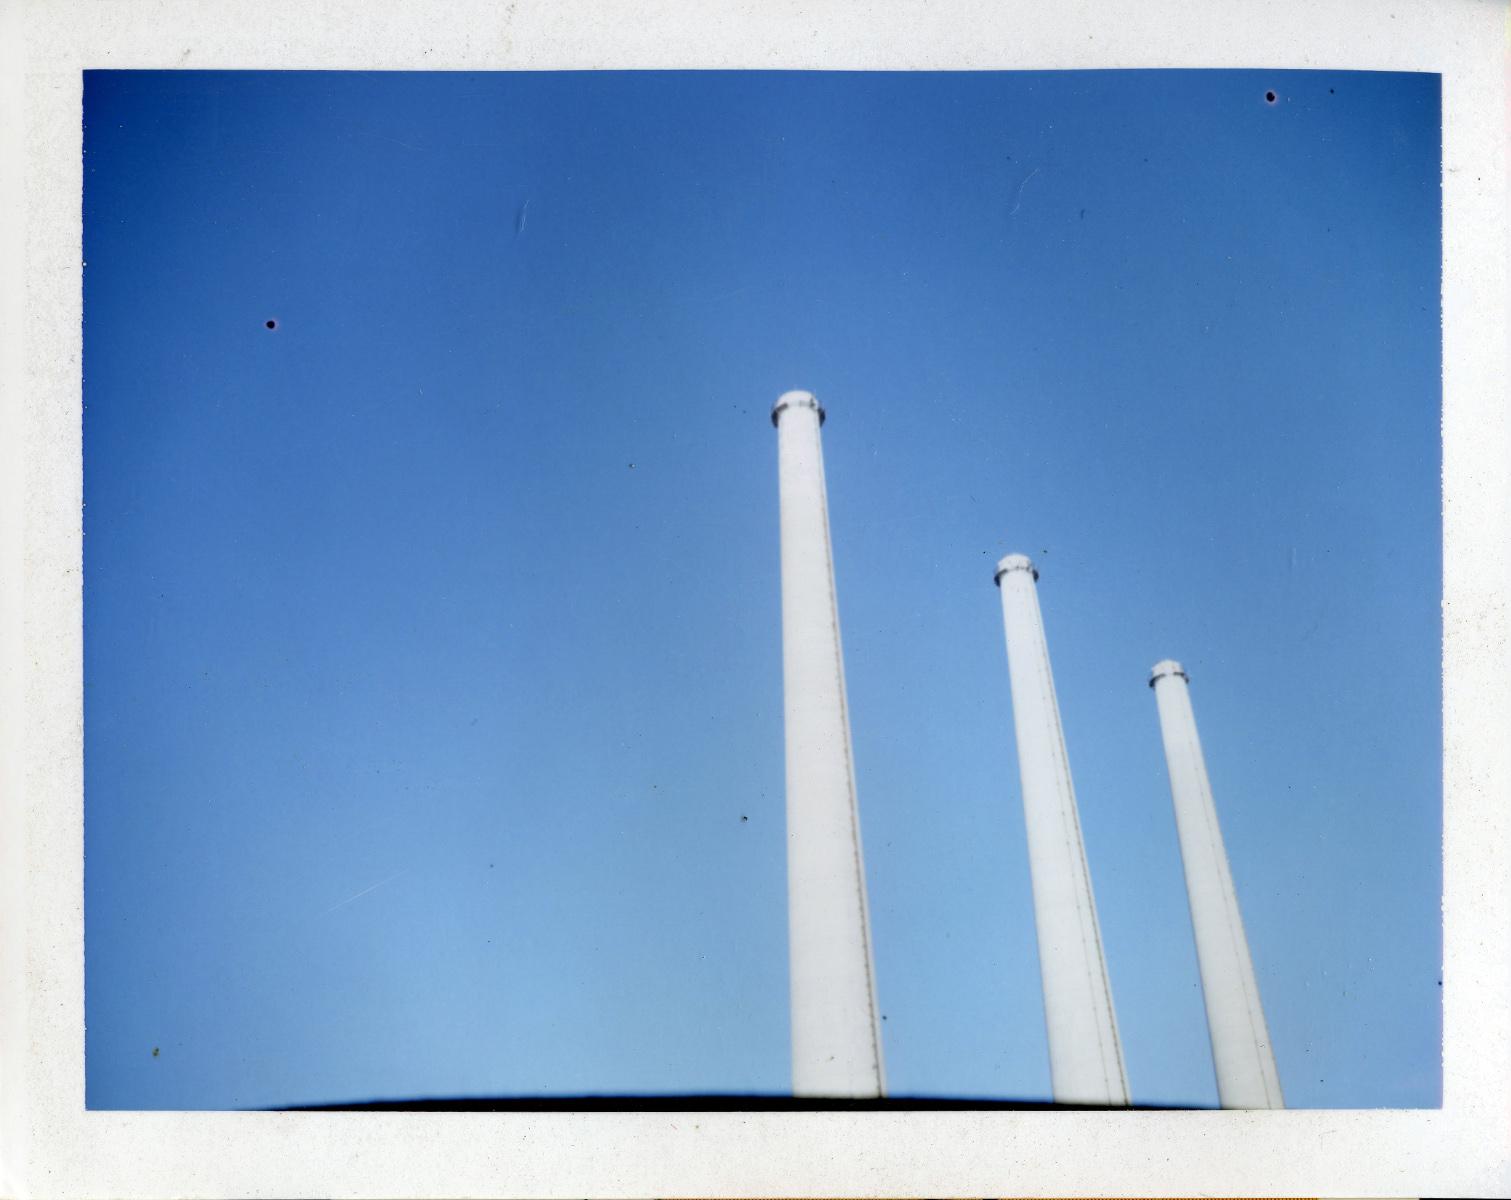 polaroid031 copy.jpg